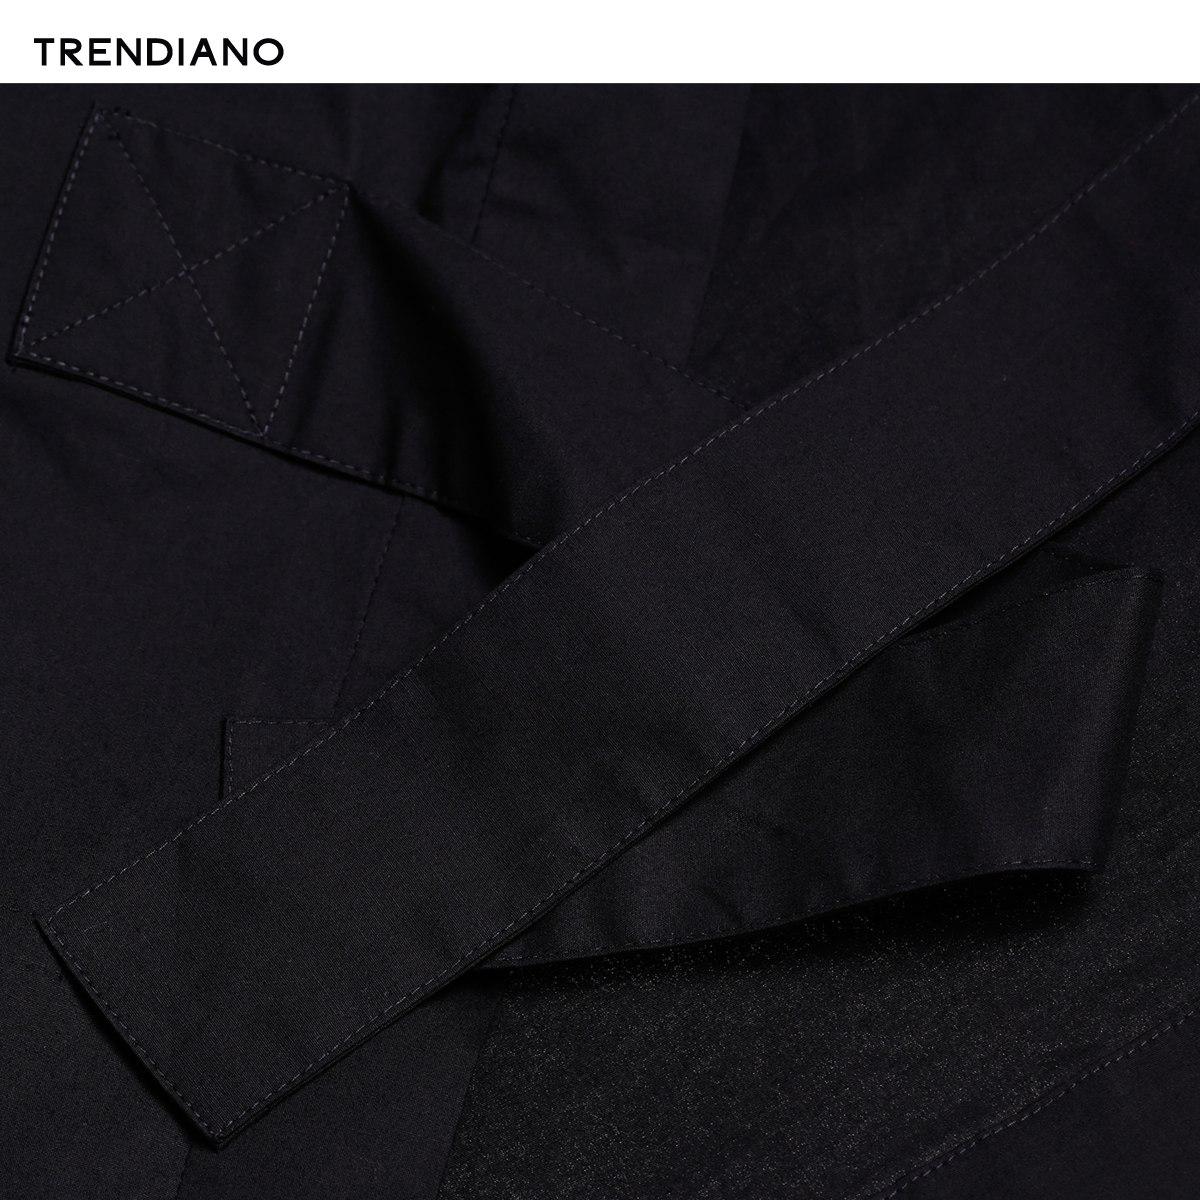 3JI2013070 男装夏装宽松中长款棉质套头短袖衬衫 TRENDIANO